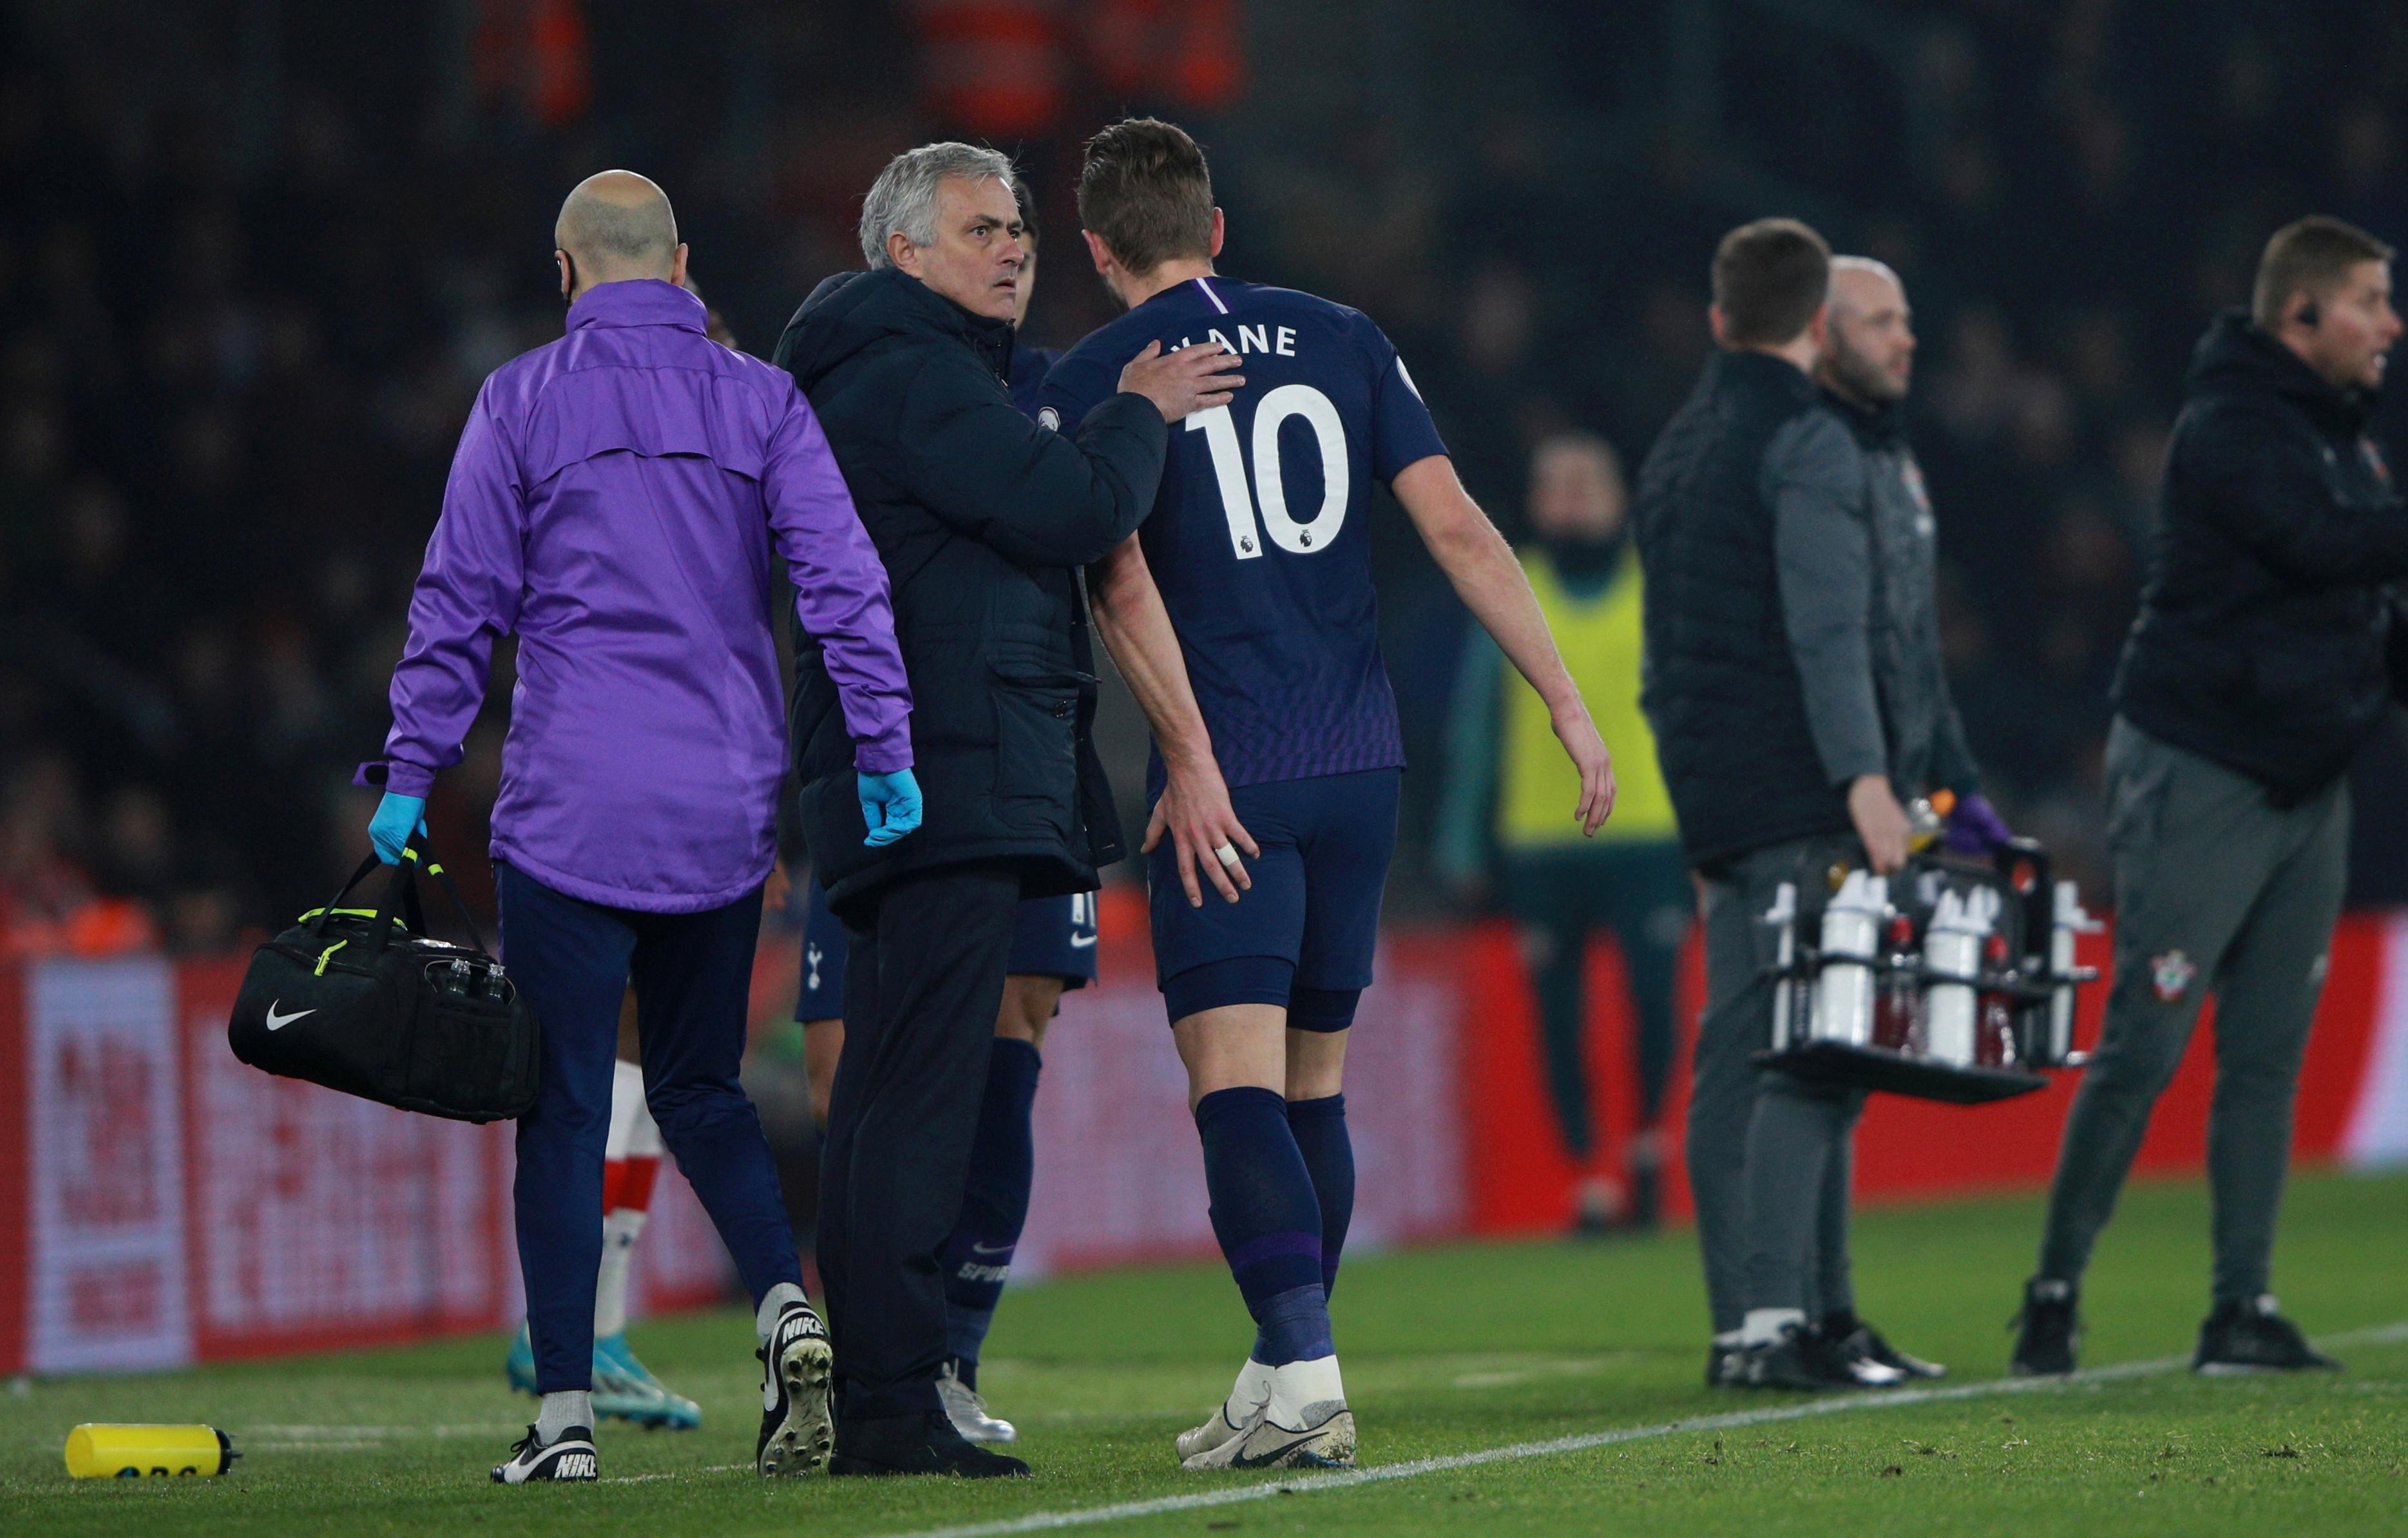 Mourinho's direct style means Tottenham miss injured Harry Kane even more than under Pochettino穆里尼奥快速直接的打法意味着穆式热刺比波切蒂诺治下更需要目前仍然伤缺的凯恩